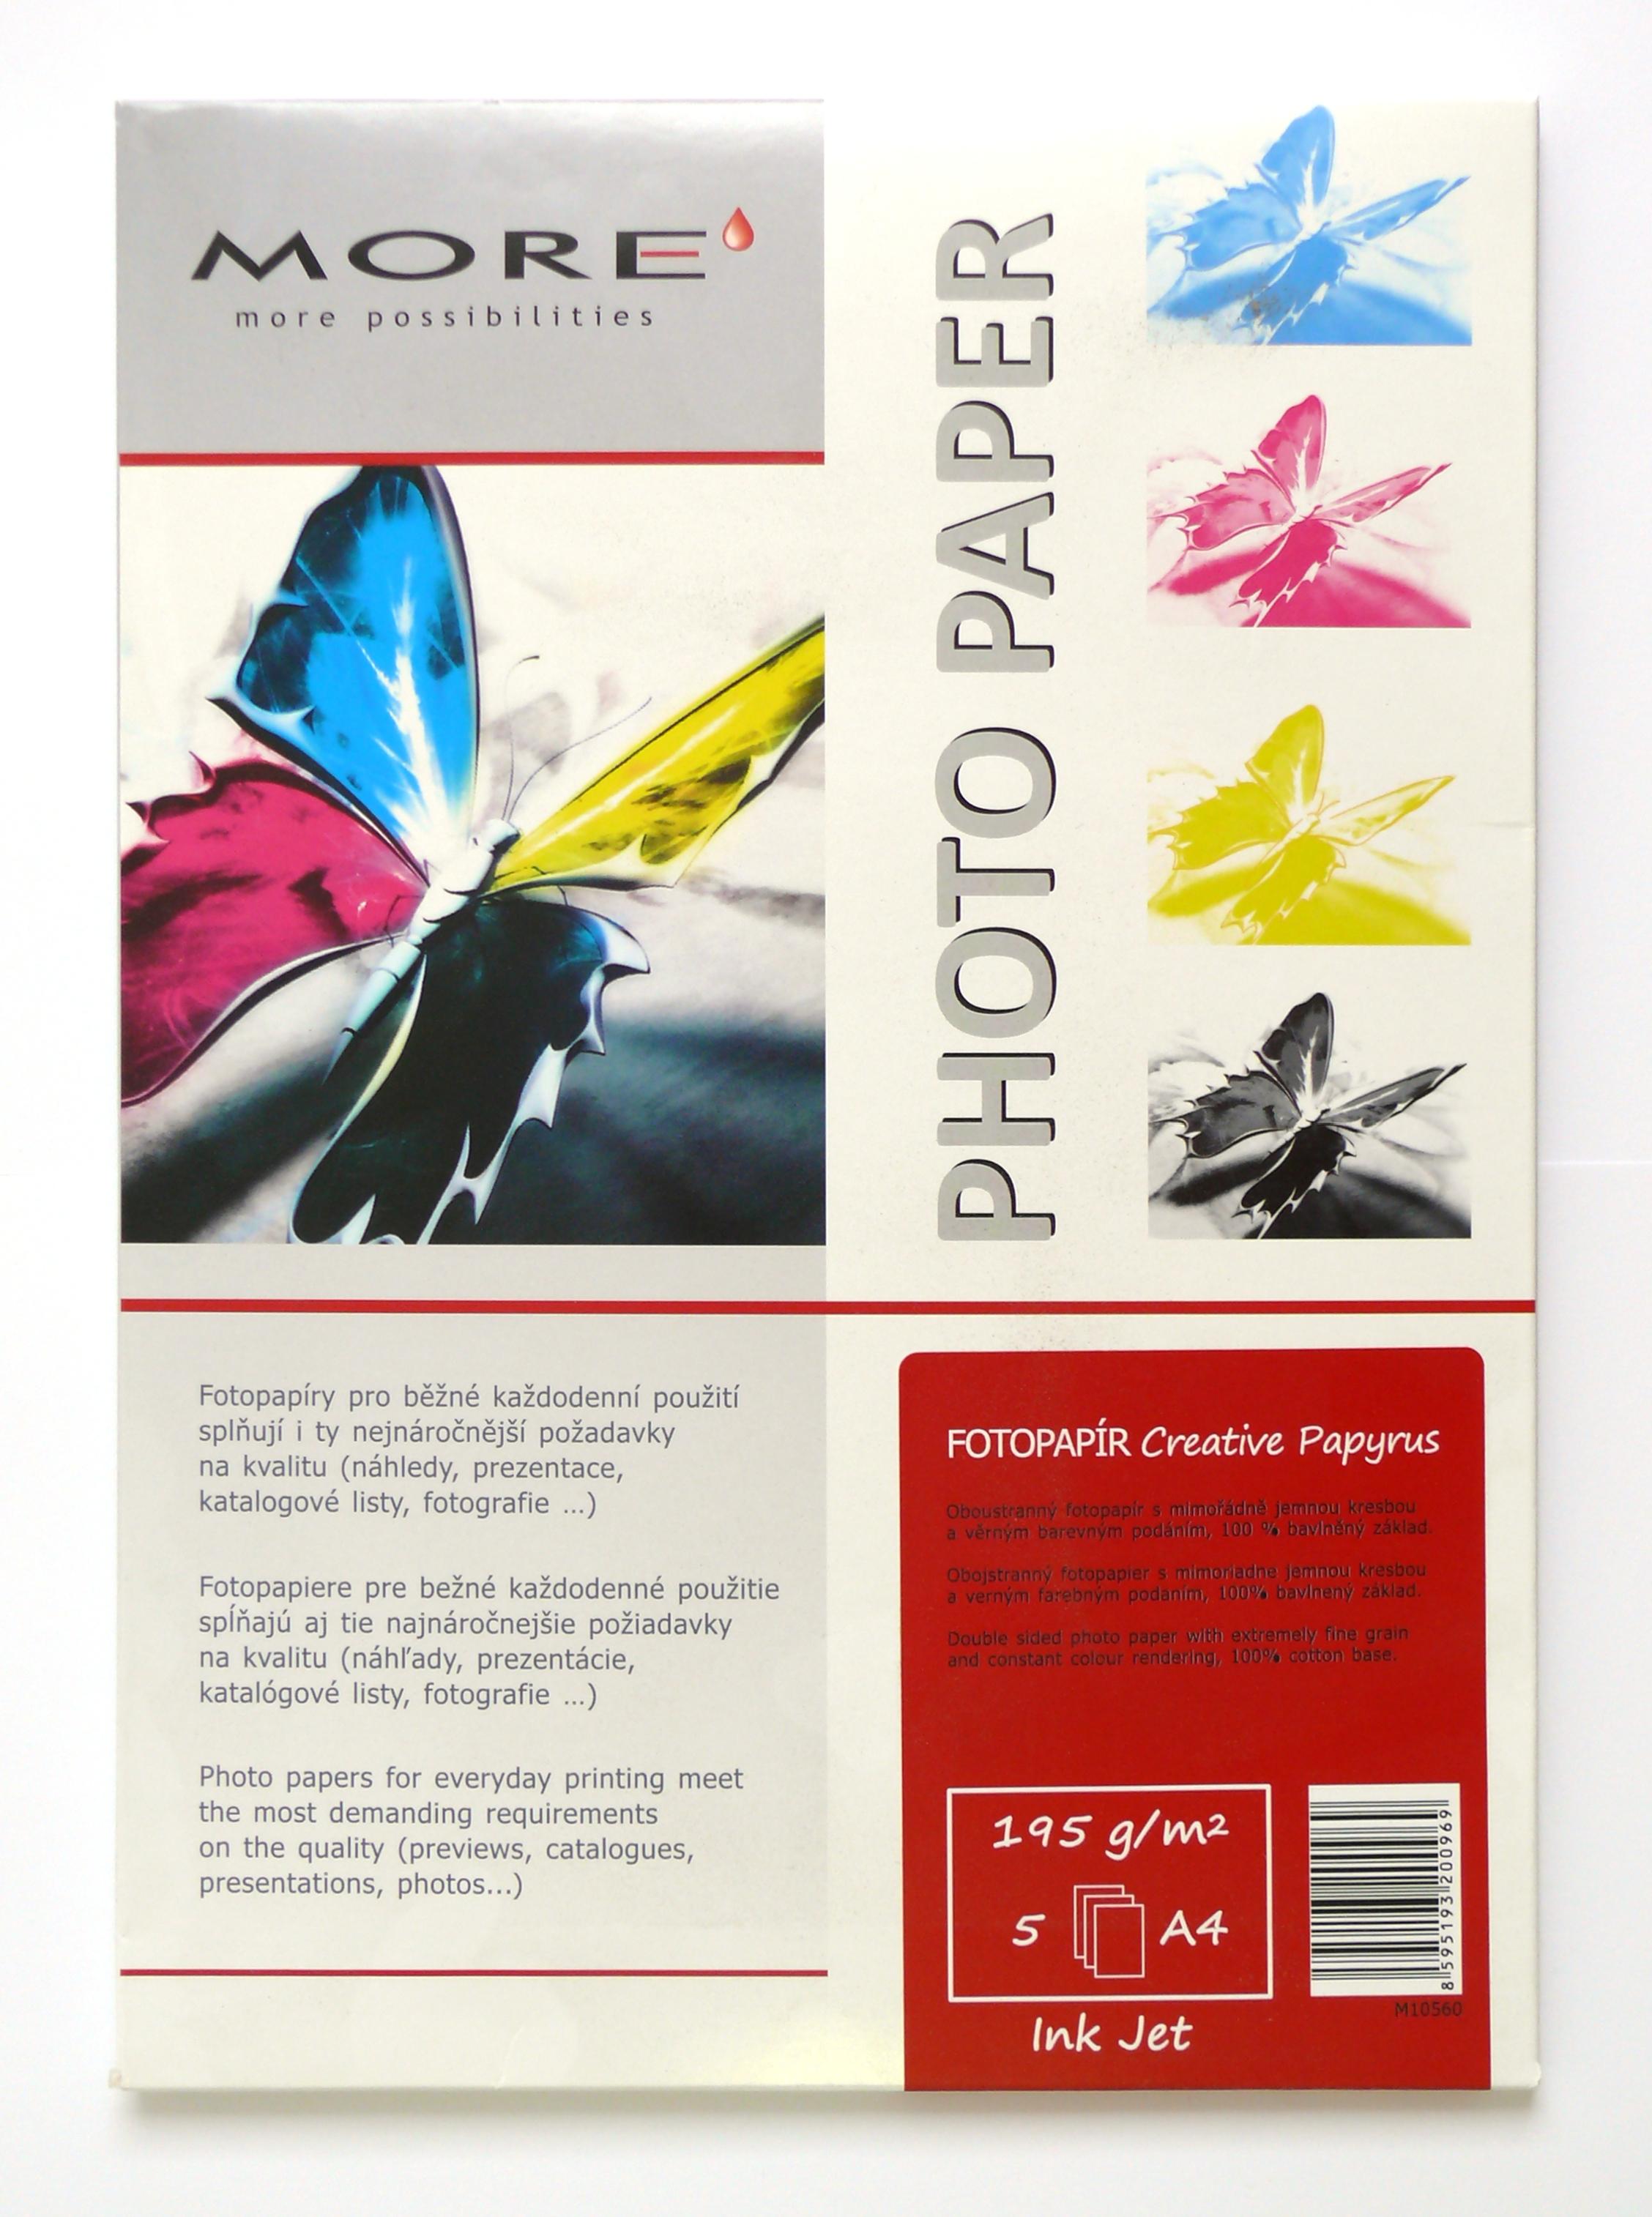 Armor fotopapír Creative Papyrus 195g oboustr 5xA4